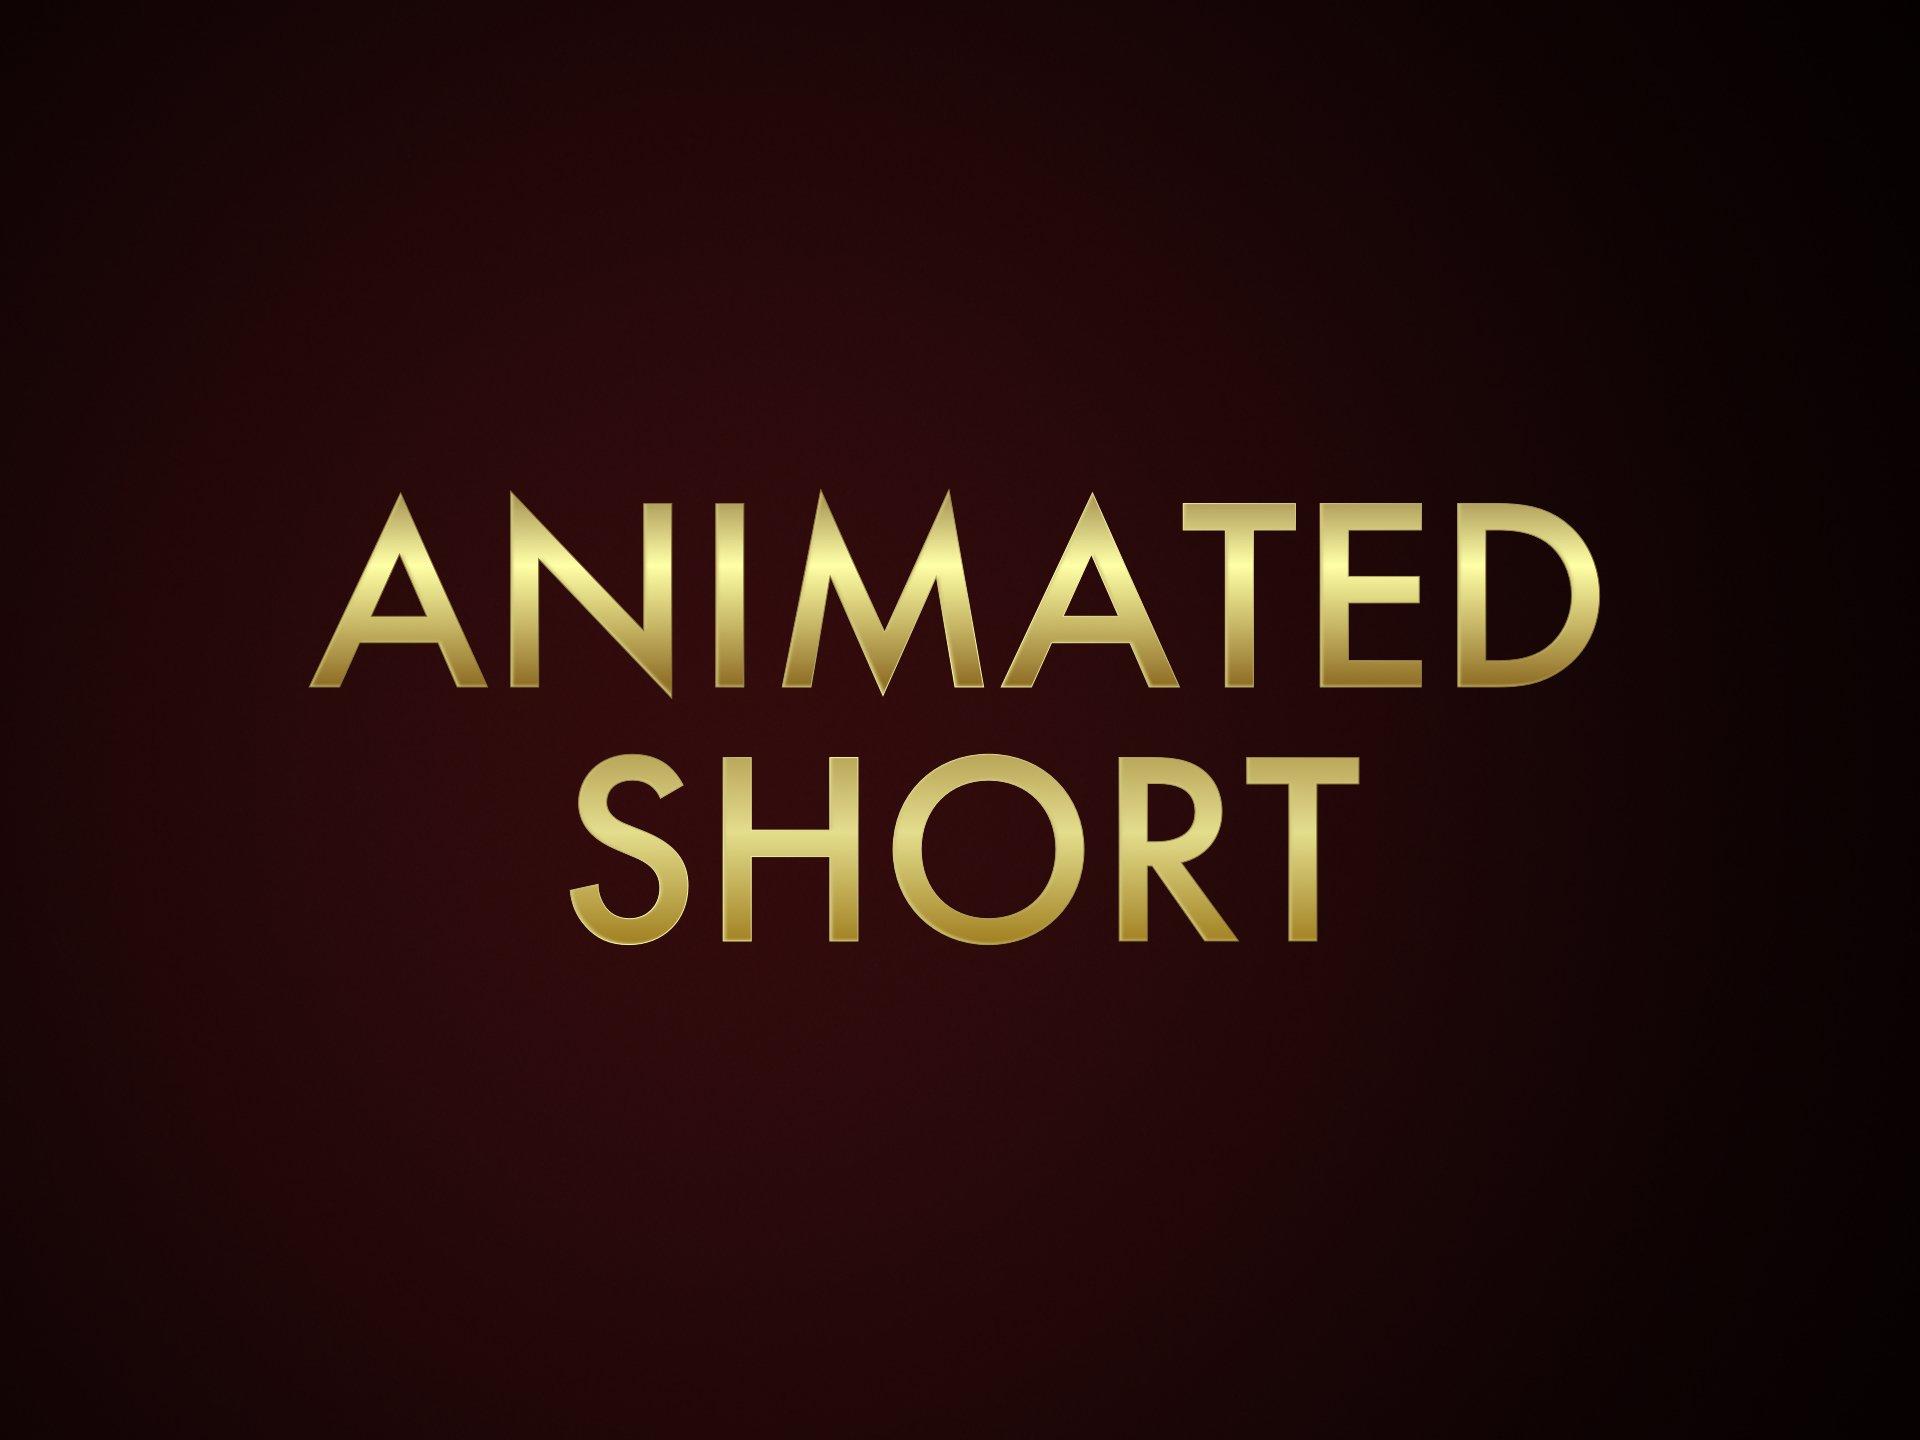 Short Film Animated Oscar Nominations 2020   Oscars 2020 News 1920x1440